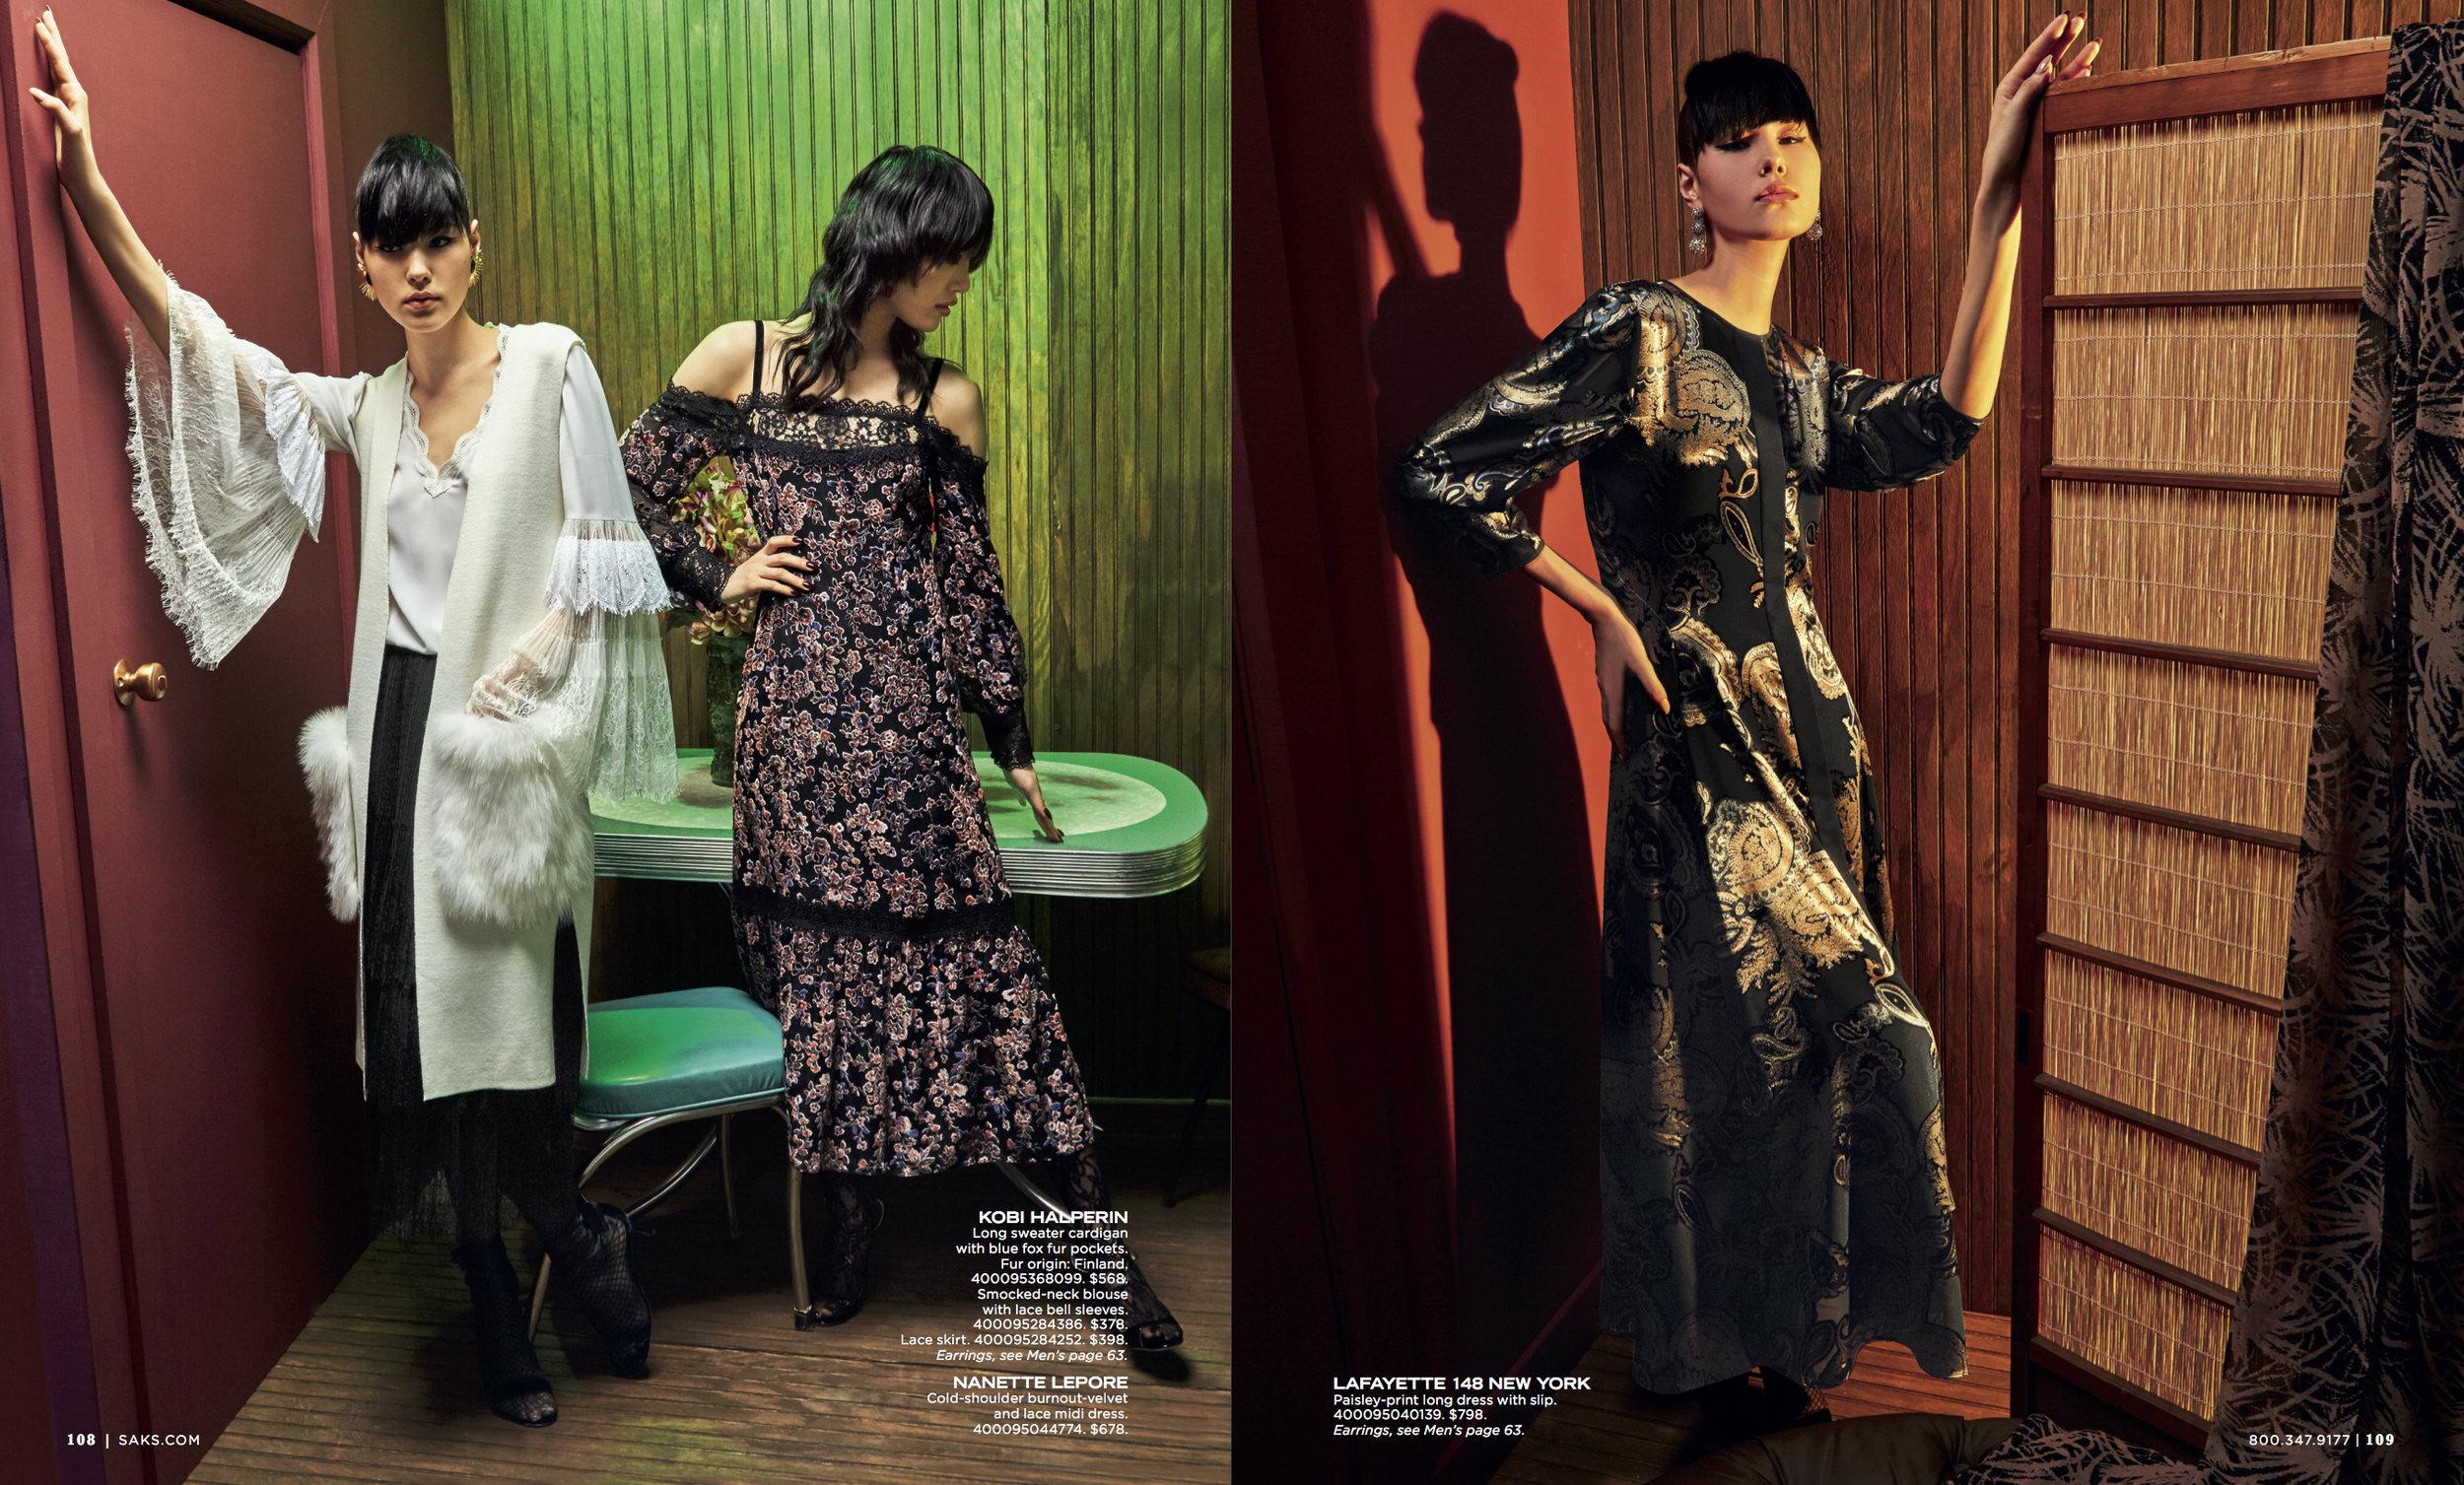 9015_SAKS_Fall Fashion_WOMAN_2017_spreads 55 copyS.jpg